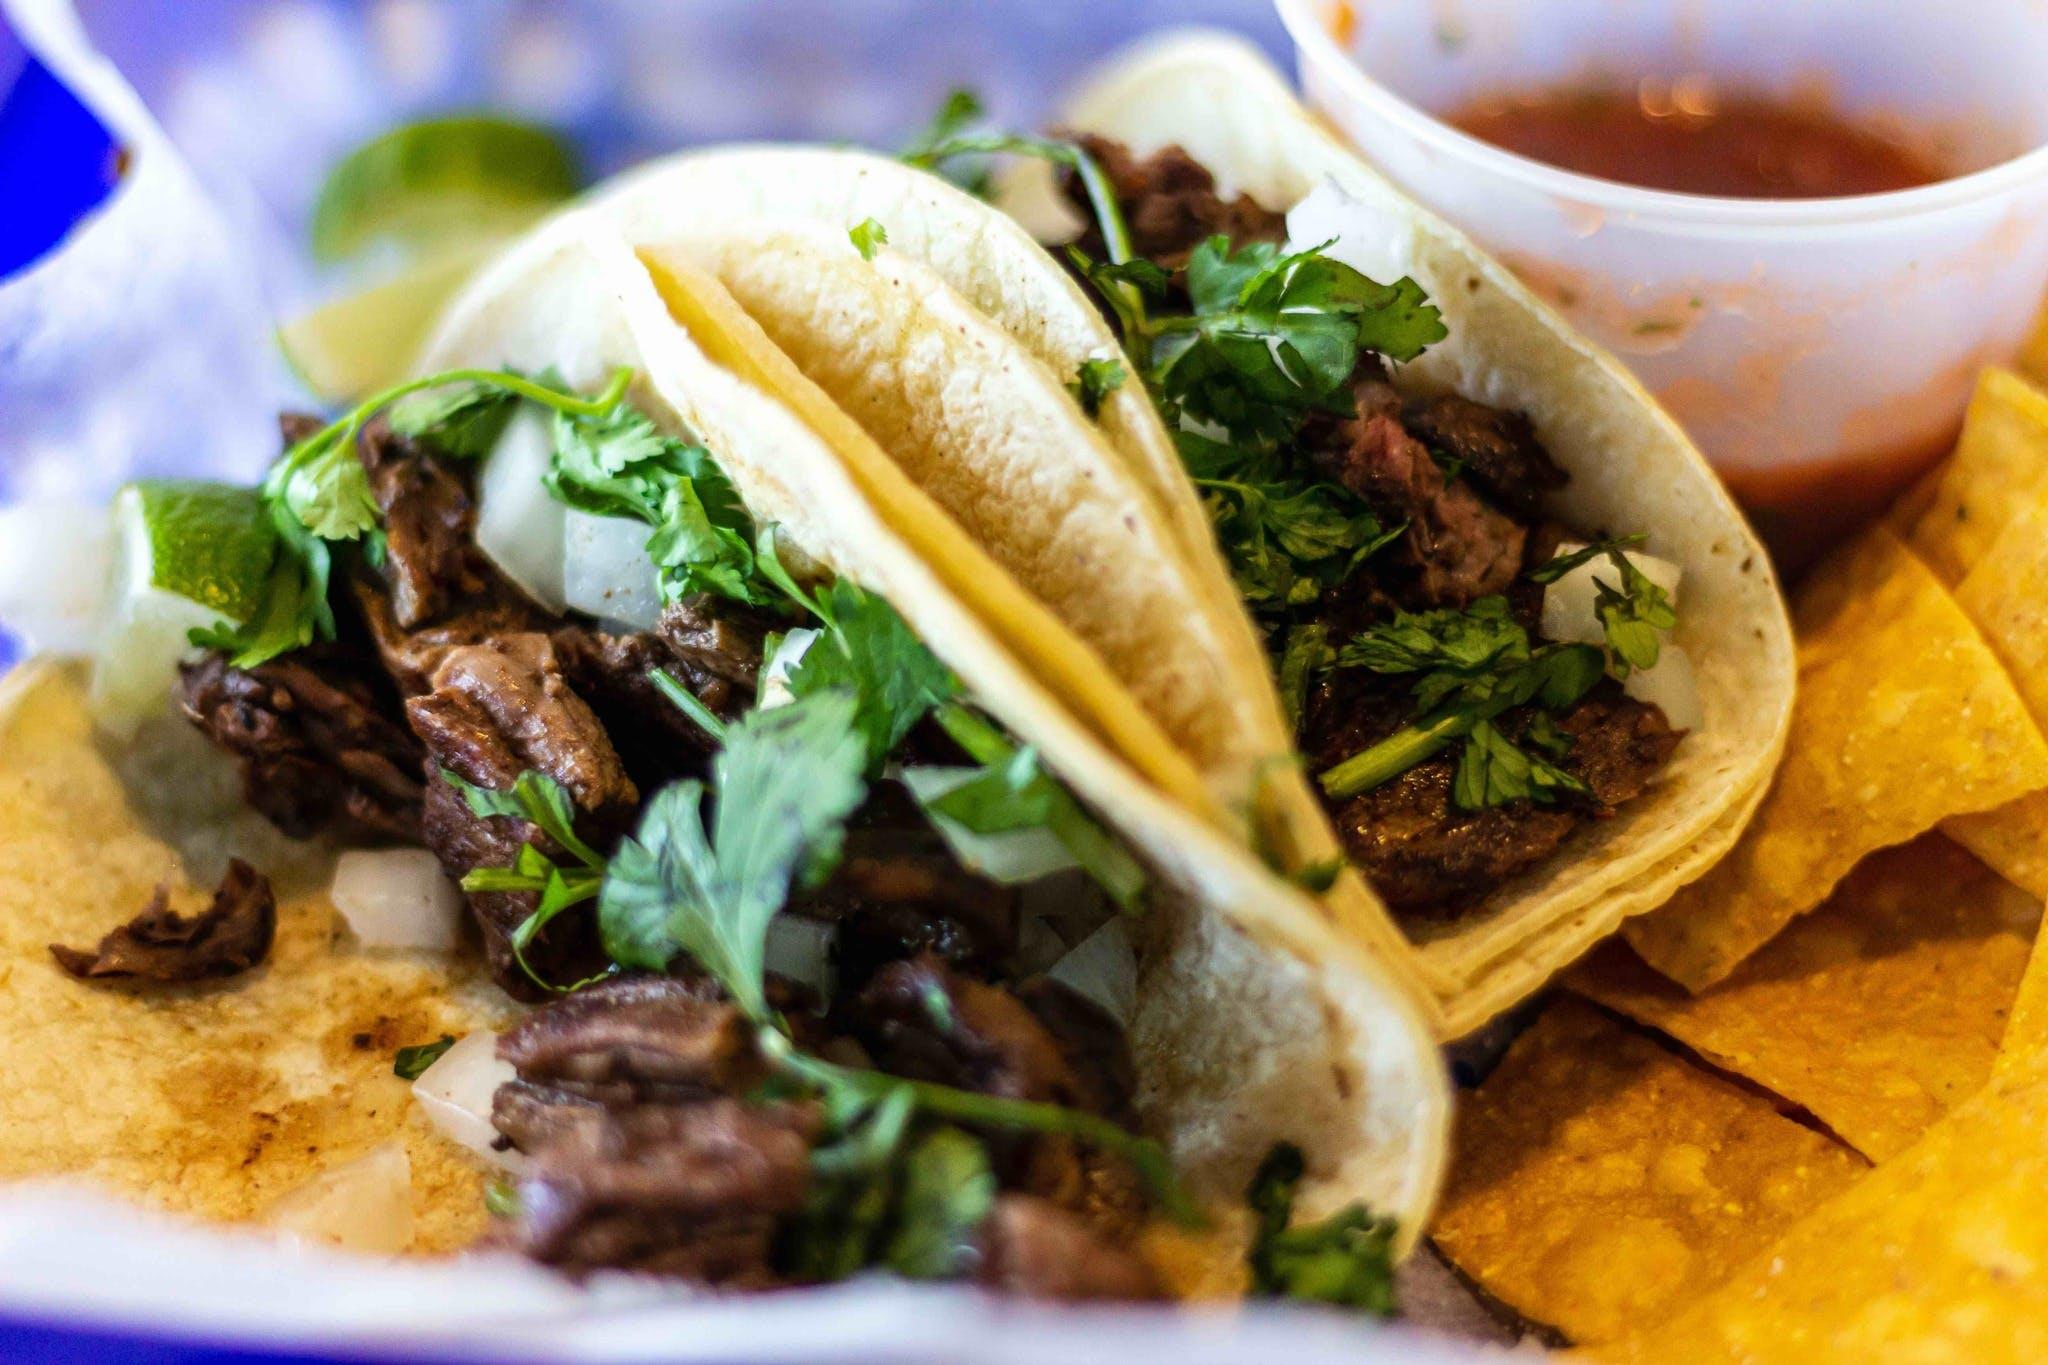 Tortas & Tacos DelValle in Waterloo - Highlight